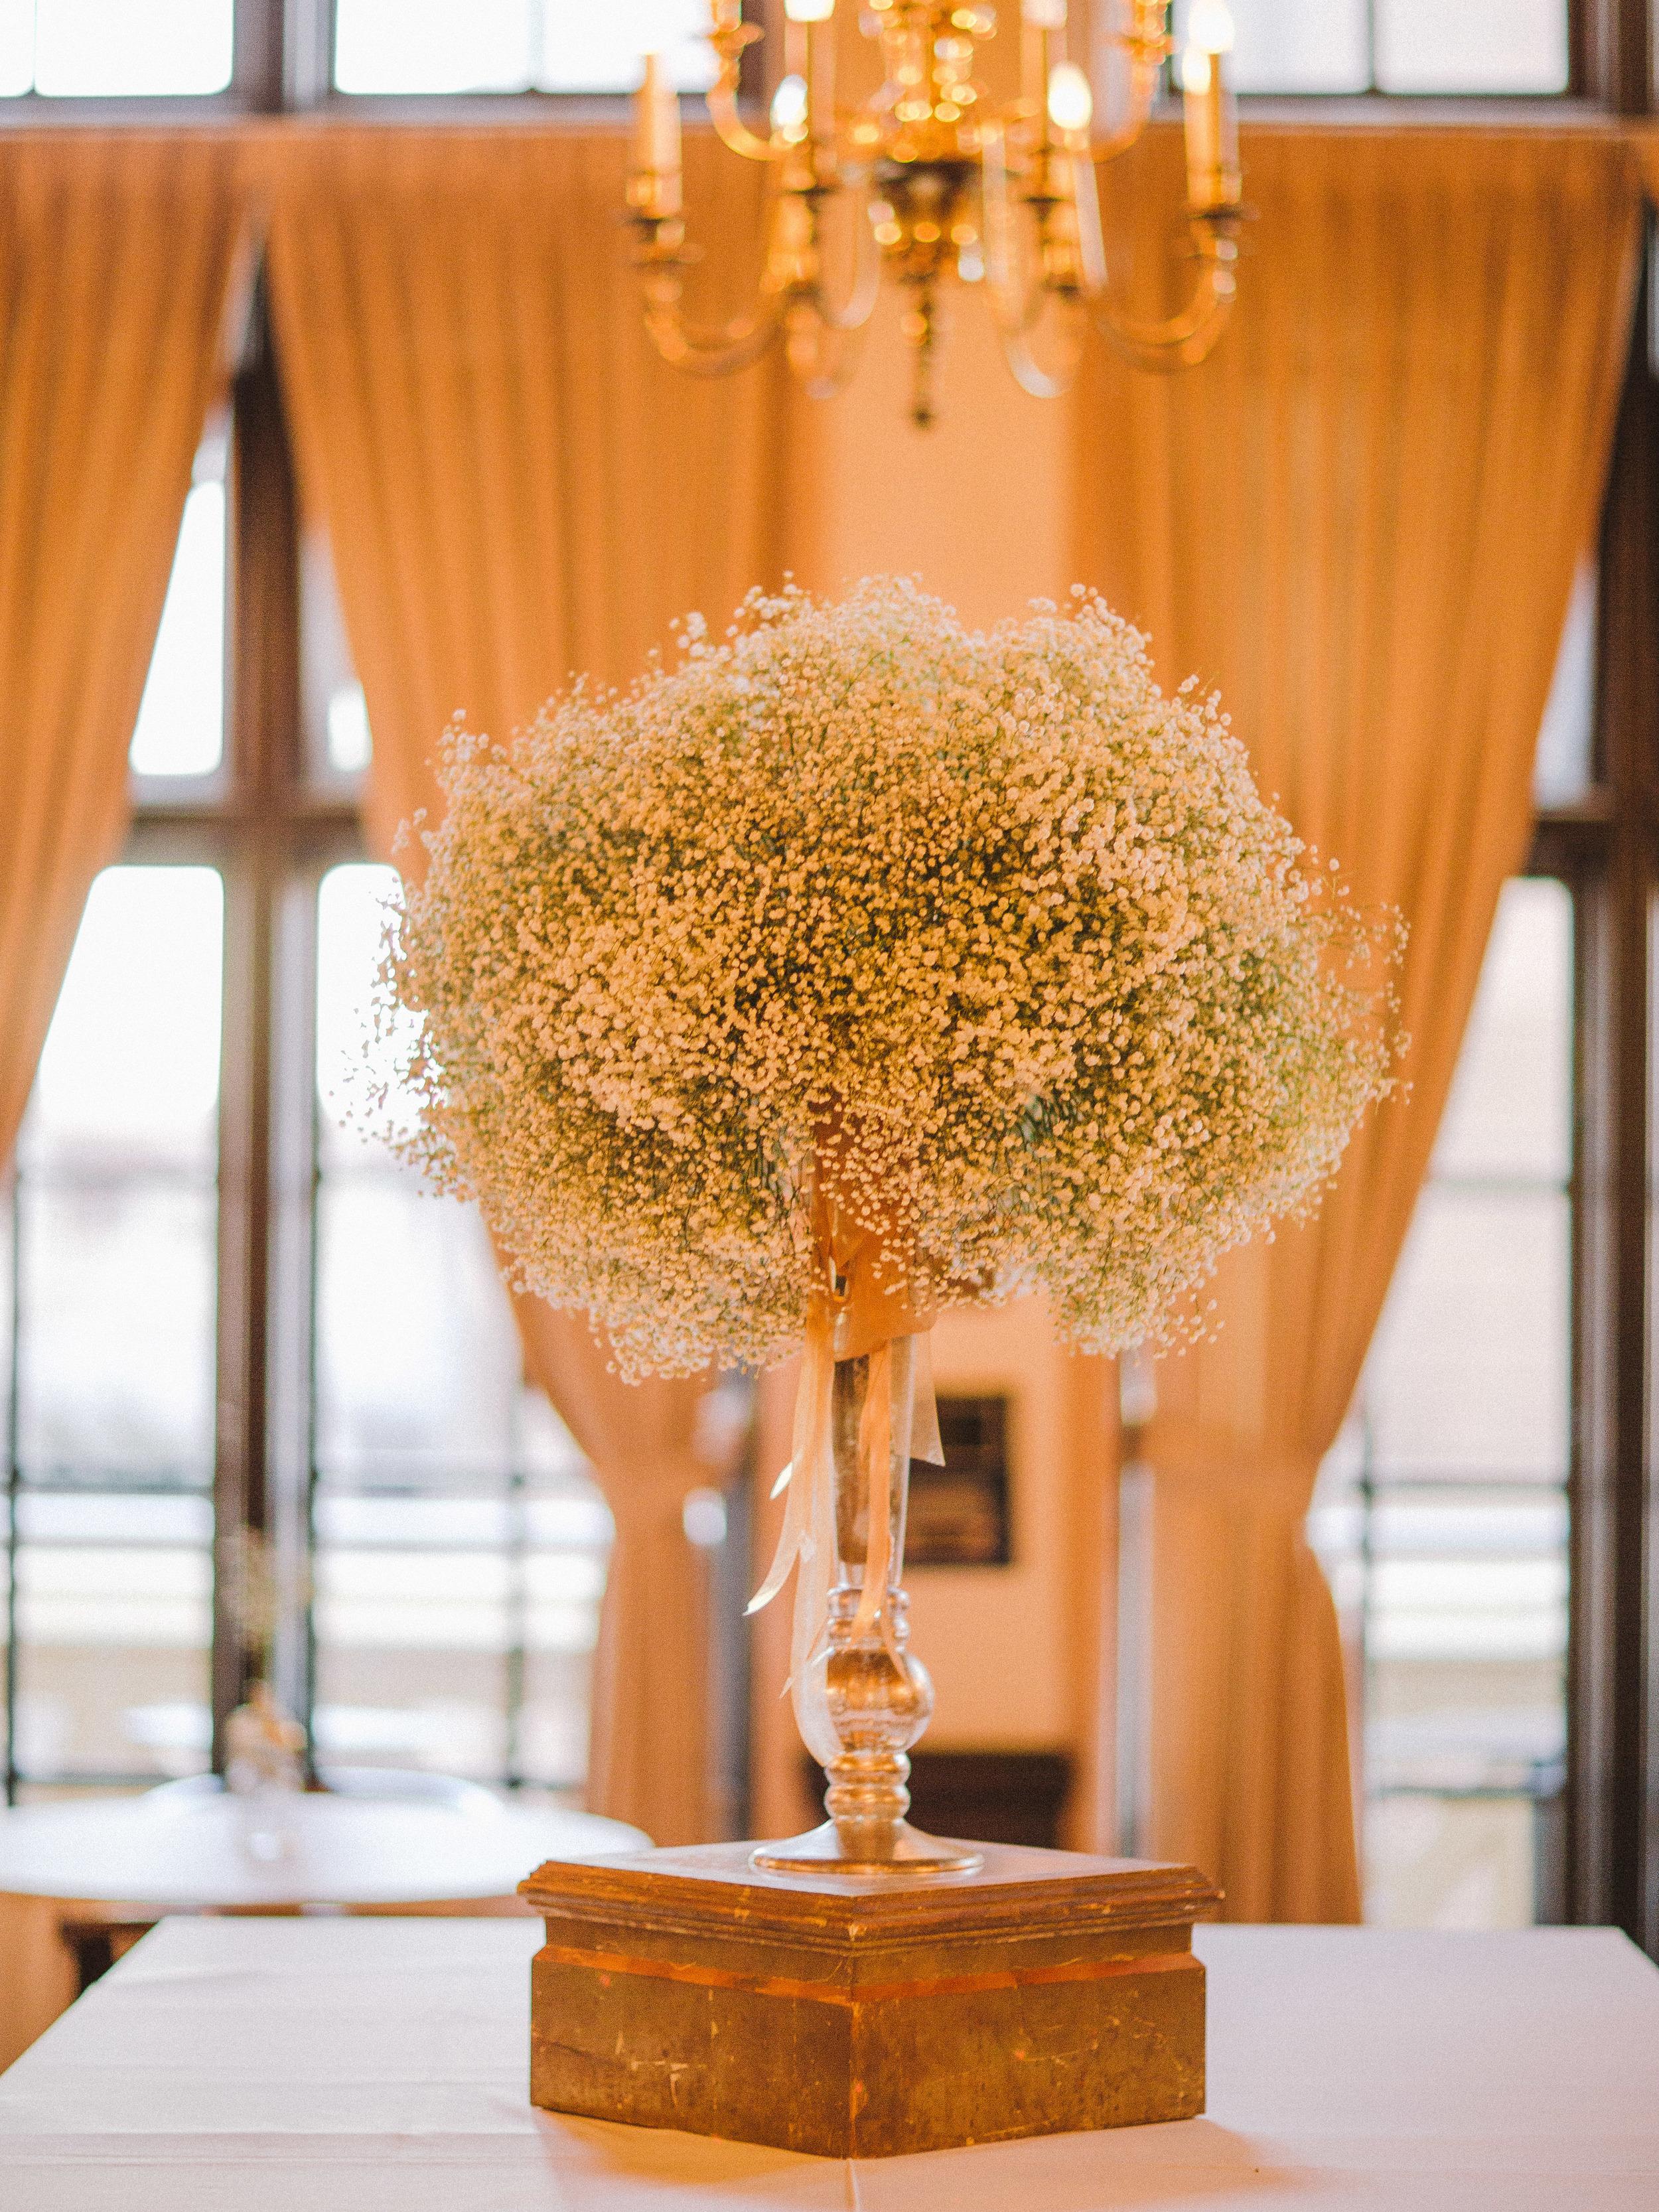 The bride's favorite flower, baby's breath